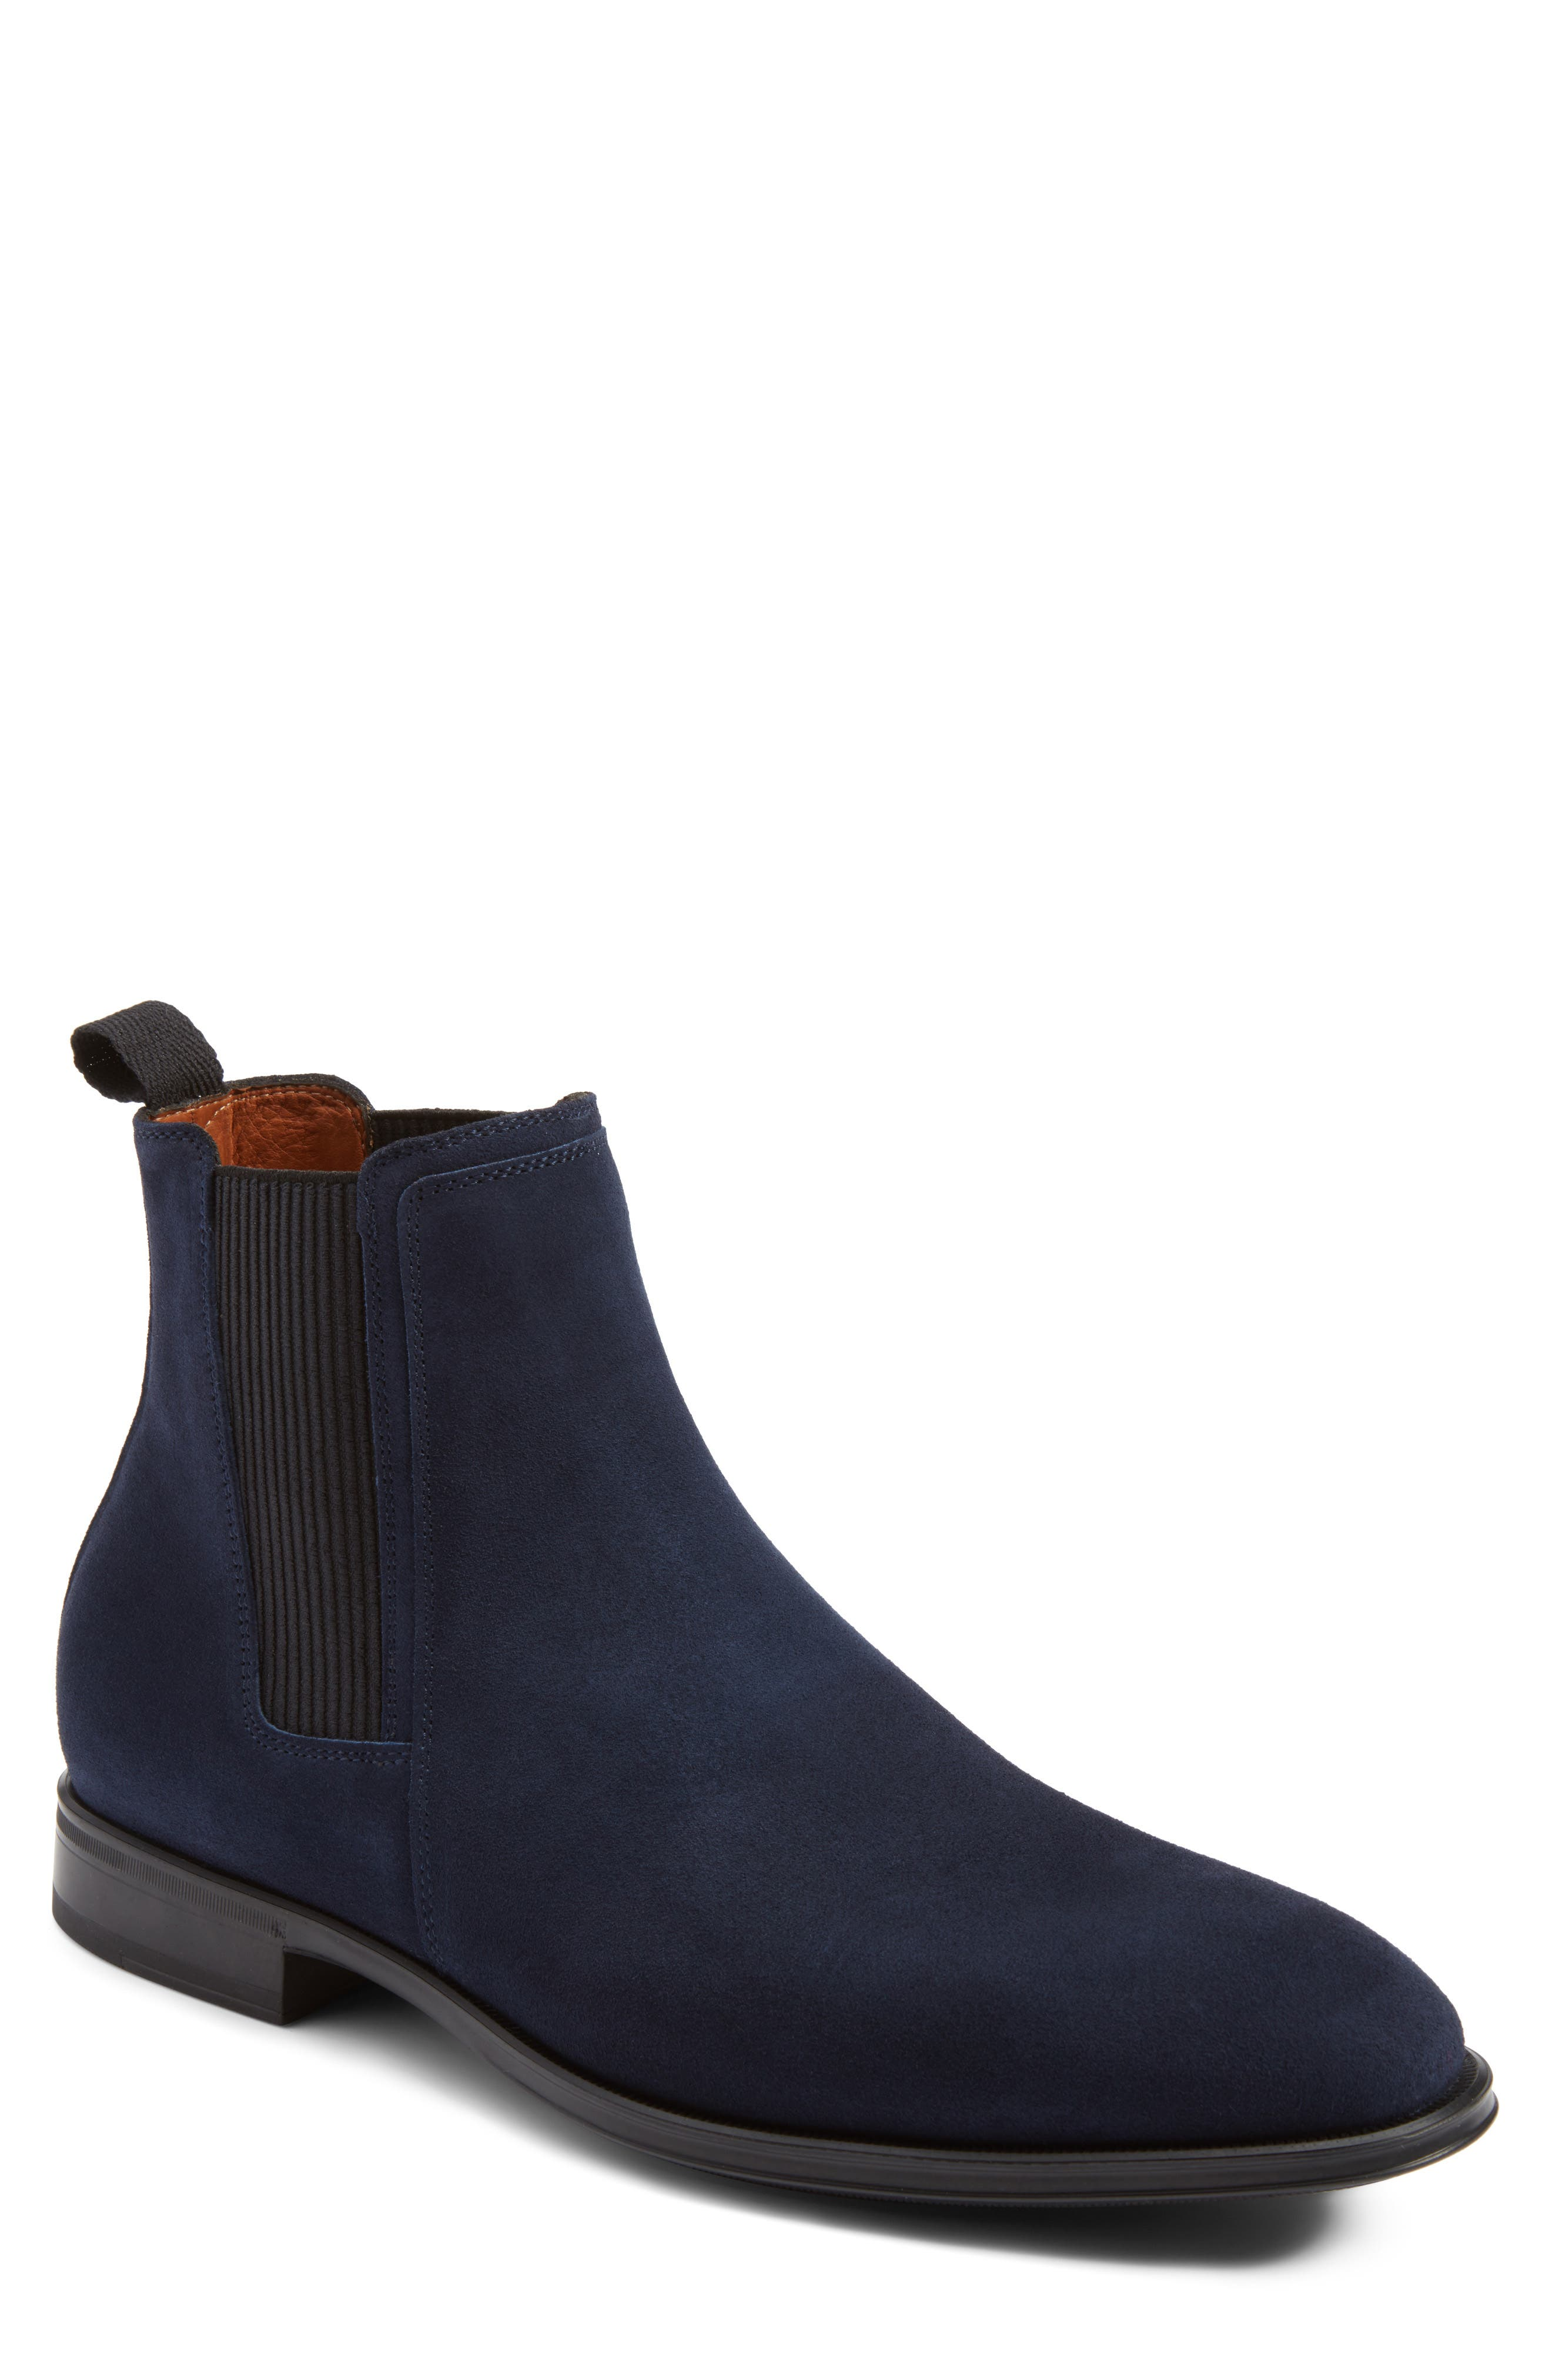 Aquatalia Damon Chelsea Boot (Men)